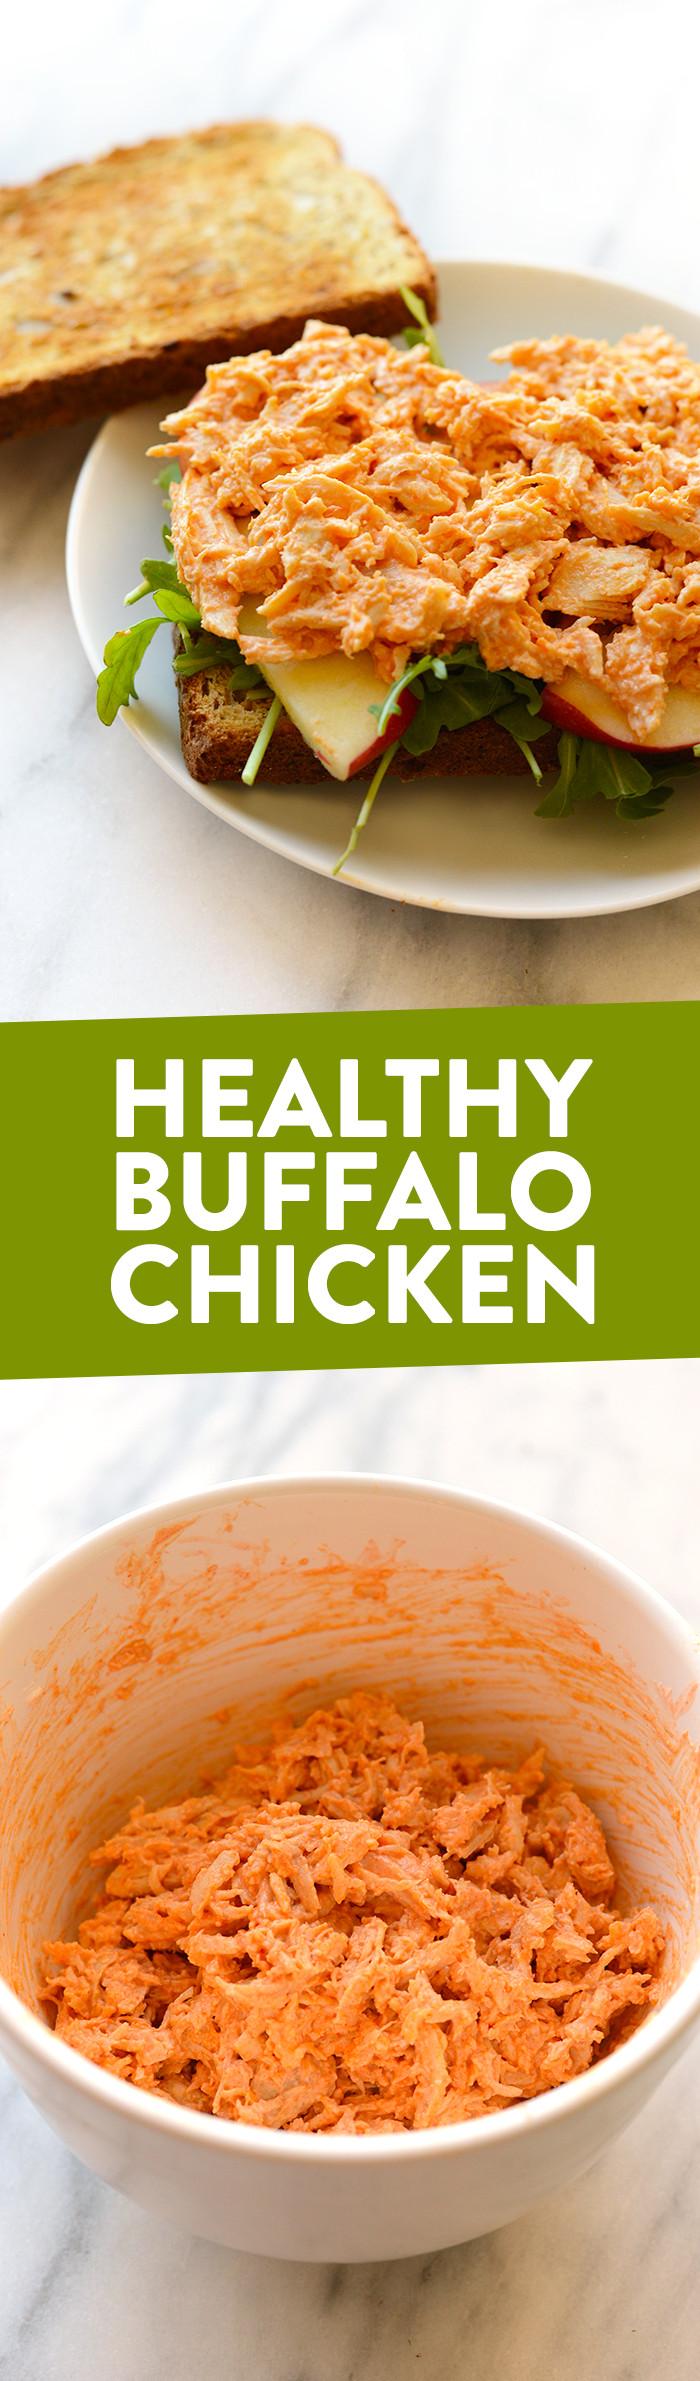 Healthy Buffalo Chicken Recipes  Healthy Buffalo Chicken Recipe Video Fit Foo Finds